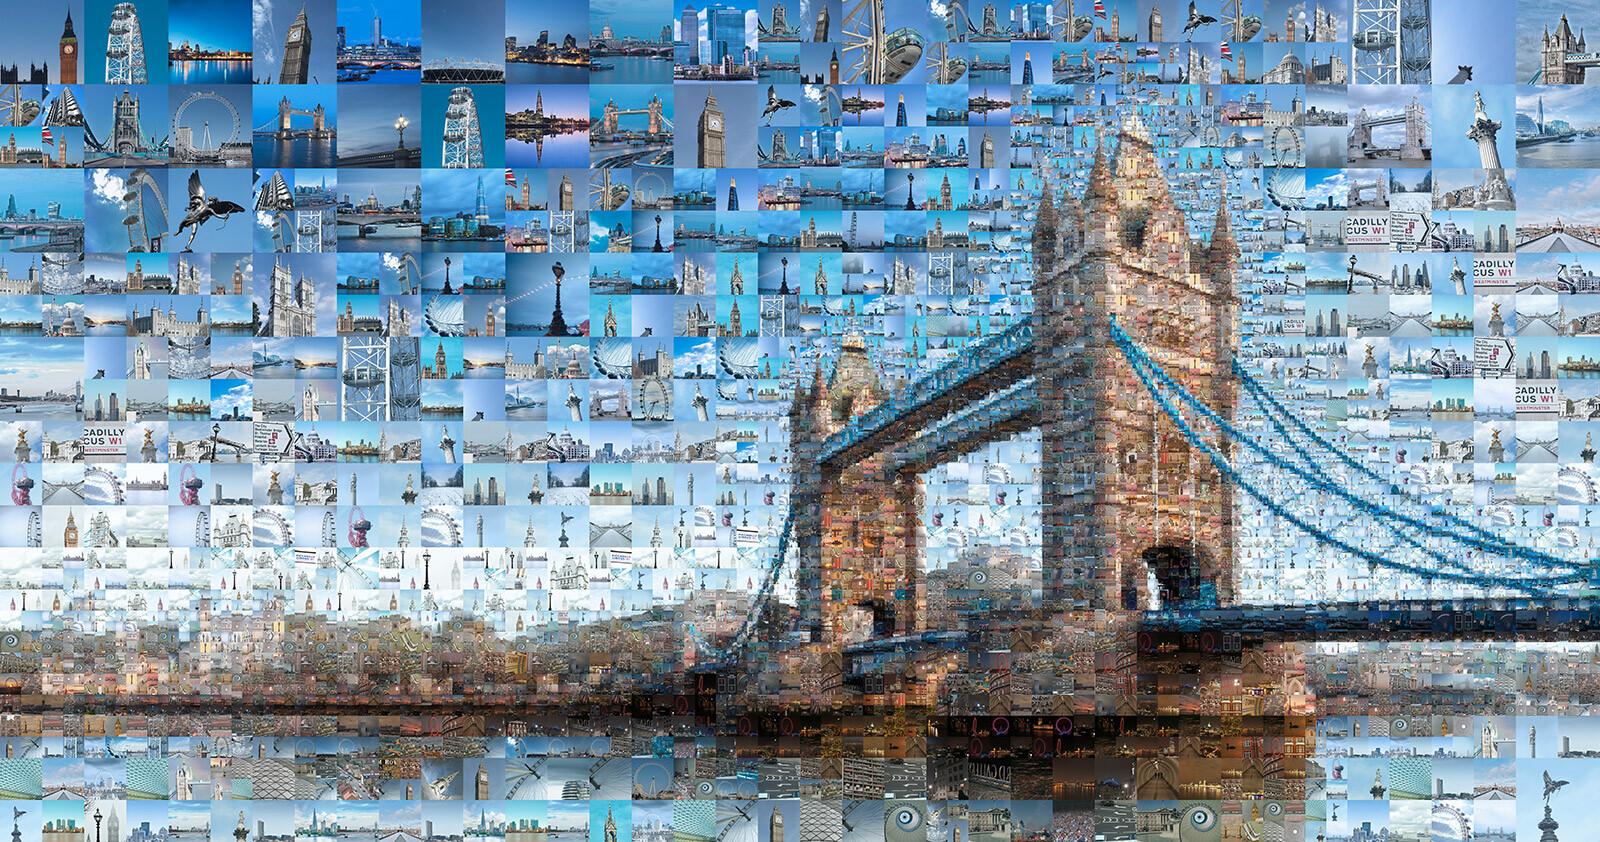 Our London II - Charis Tsevis